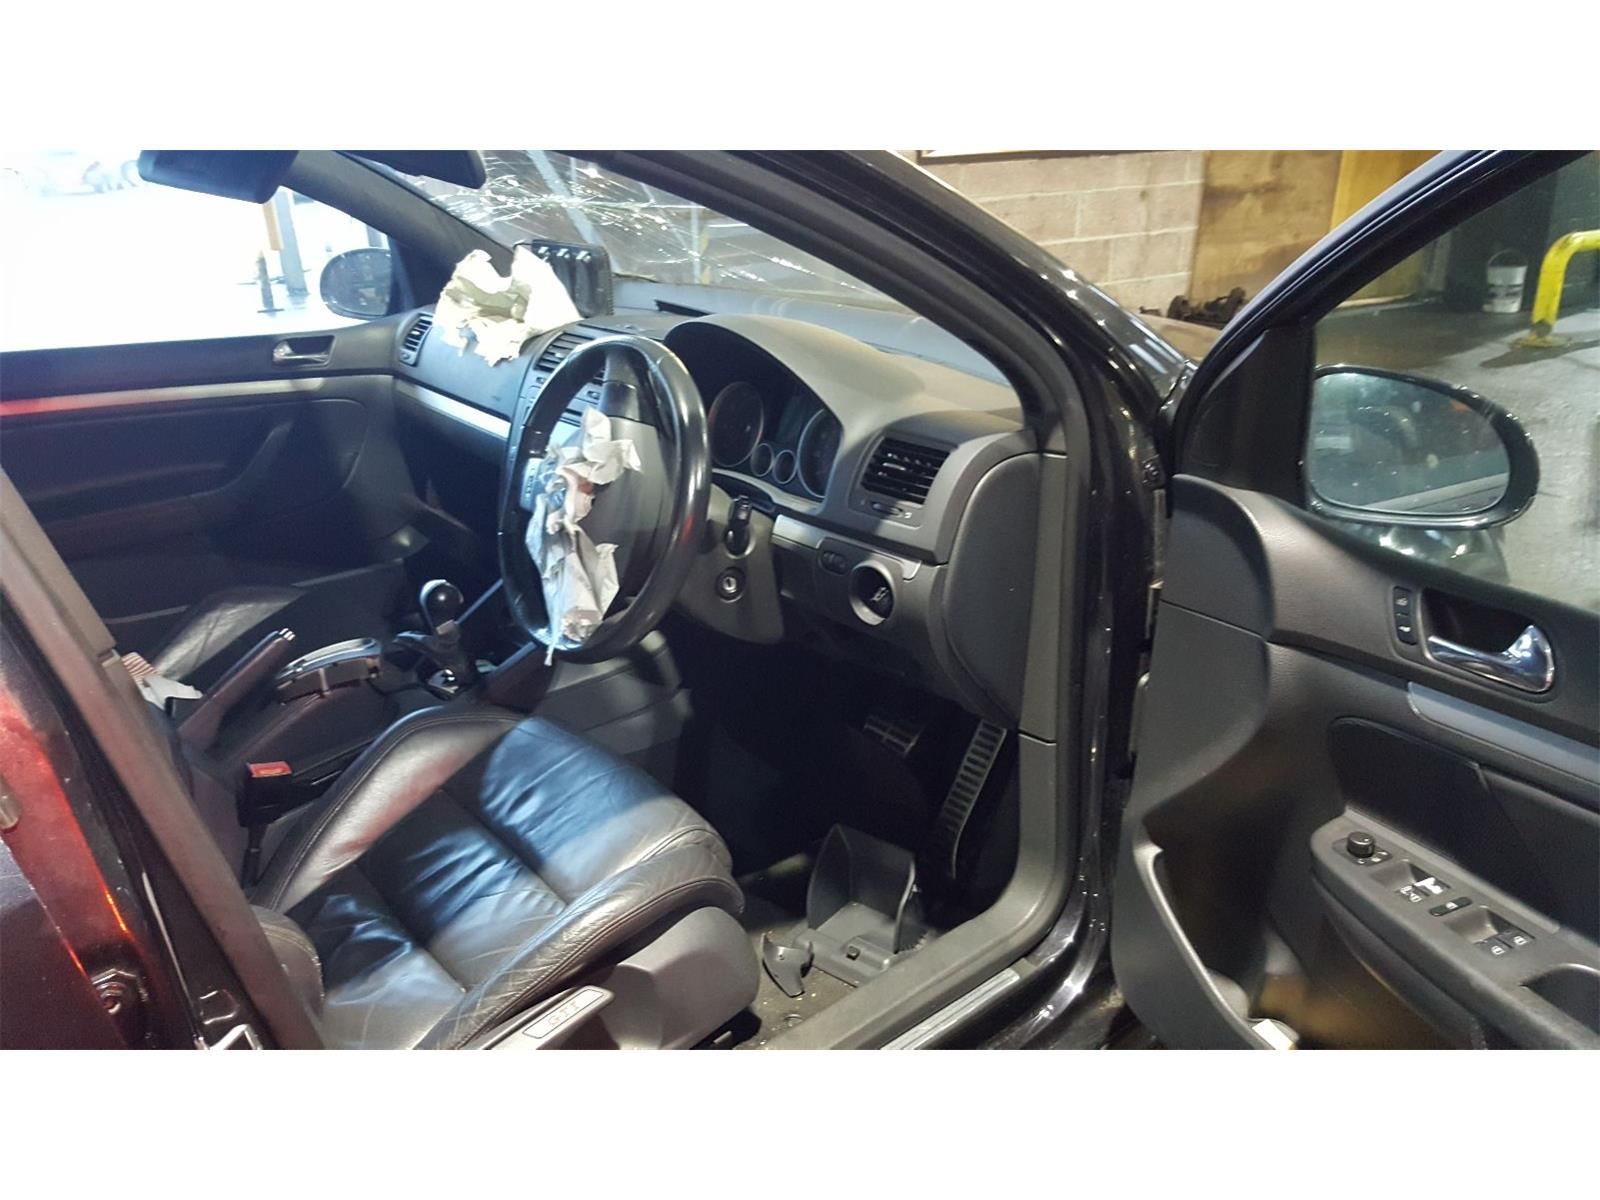 Volkswagen Golf Mk5 2003 To 2009 Gti 5 Door Hatchback Scrap Skoda Fabia Comfort Fuse Box Salvage Car For Sale Auction Silverlake Autoparts